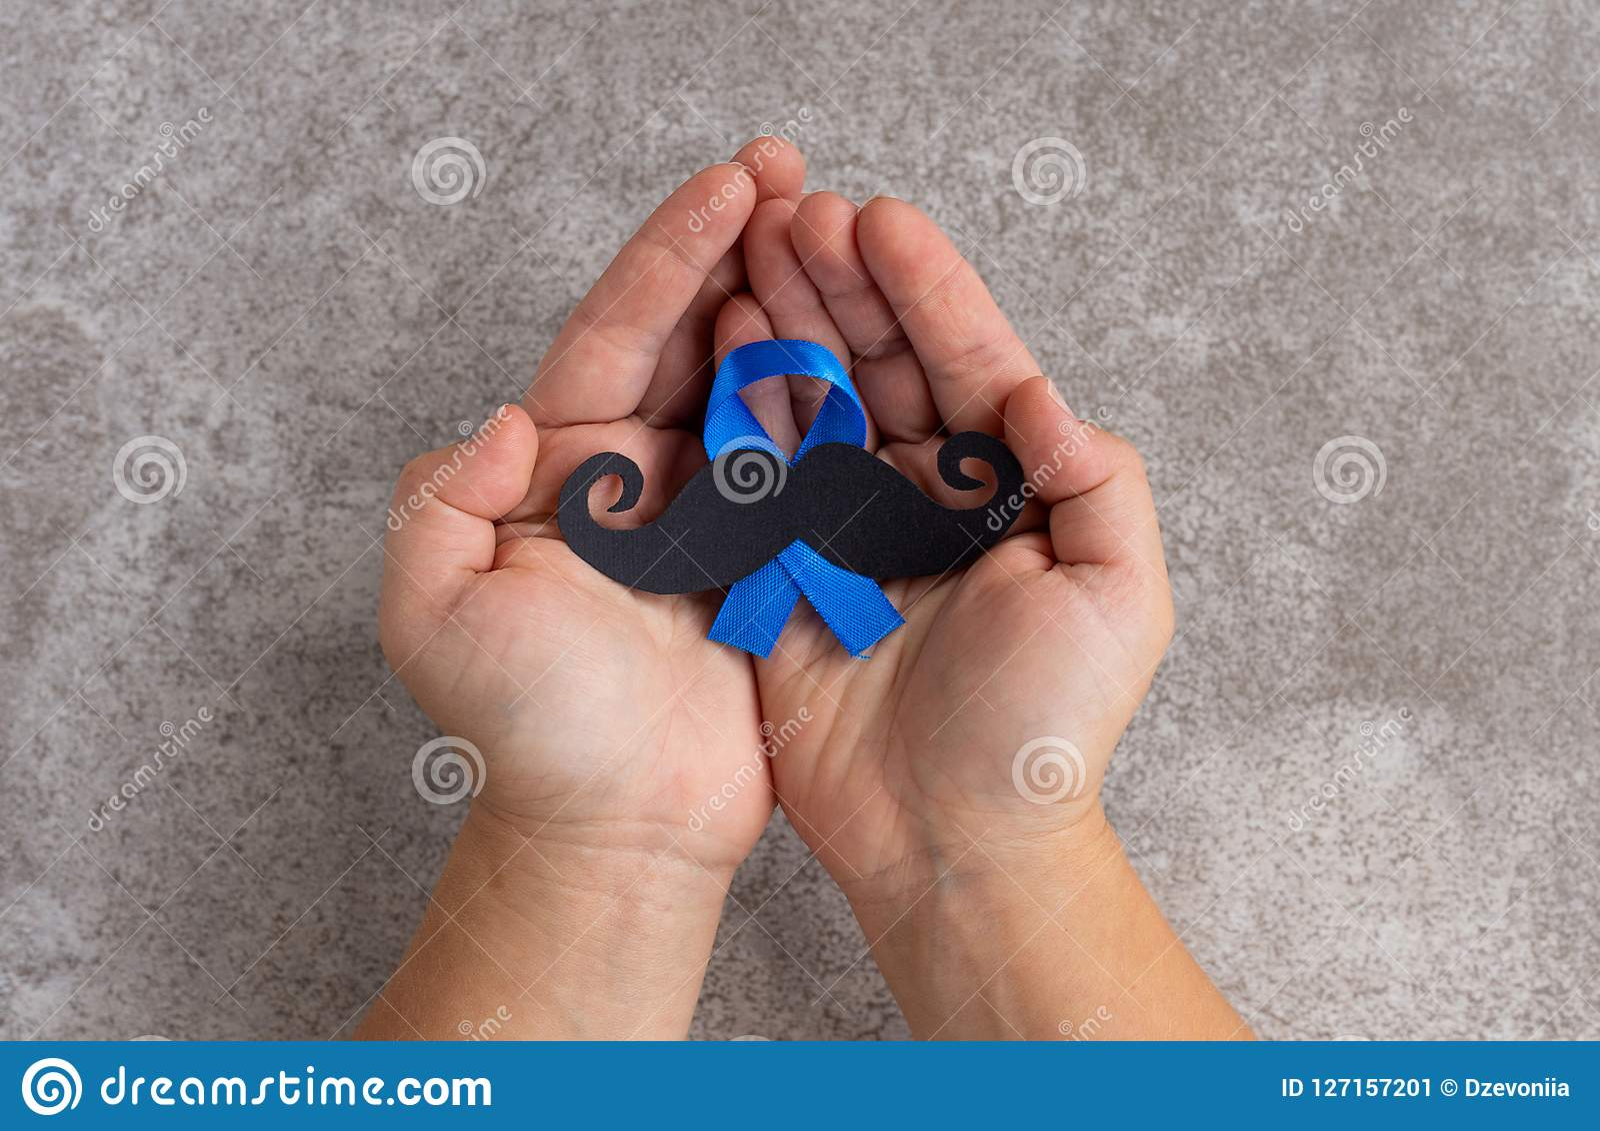 Mustache pattern with blue ribbon symbol. November movember concept.